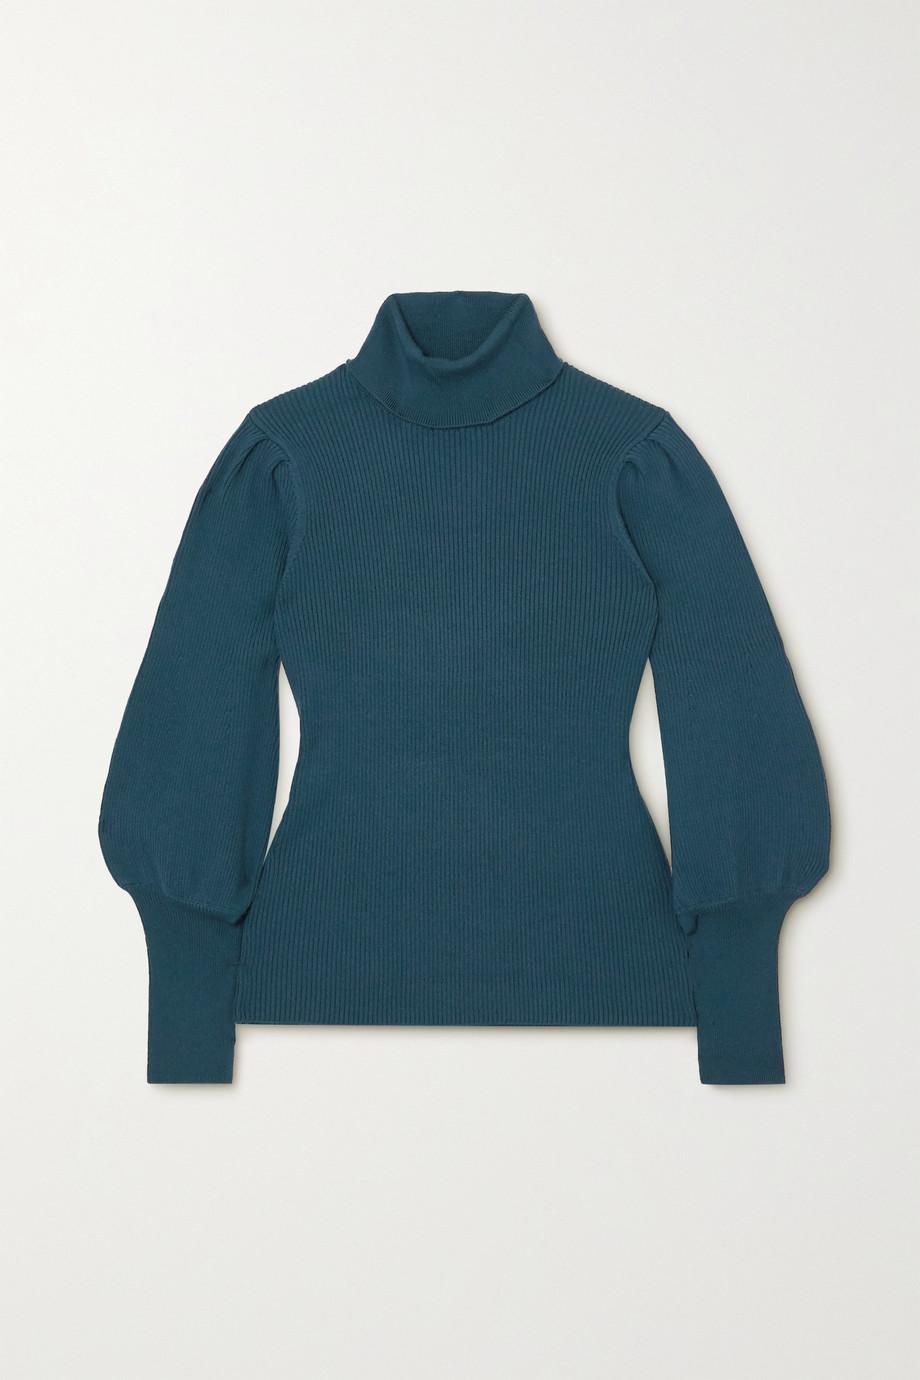 Cefinn Eva ribbed wool-blend turtleneck sweater